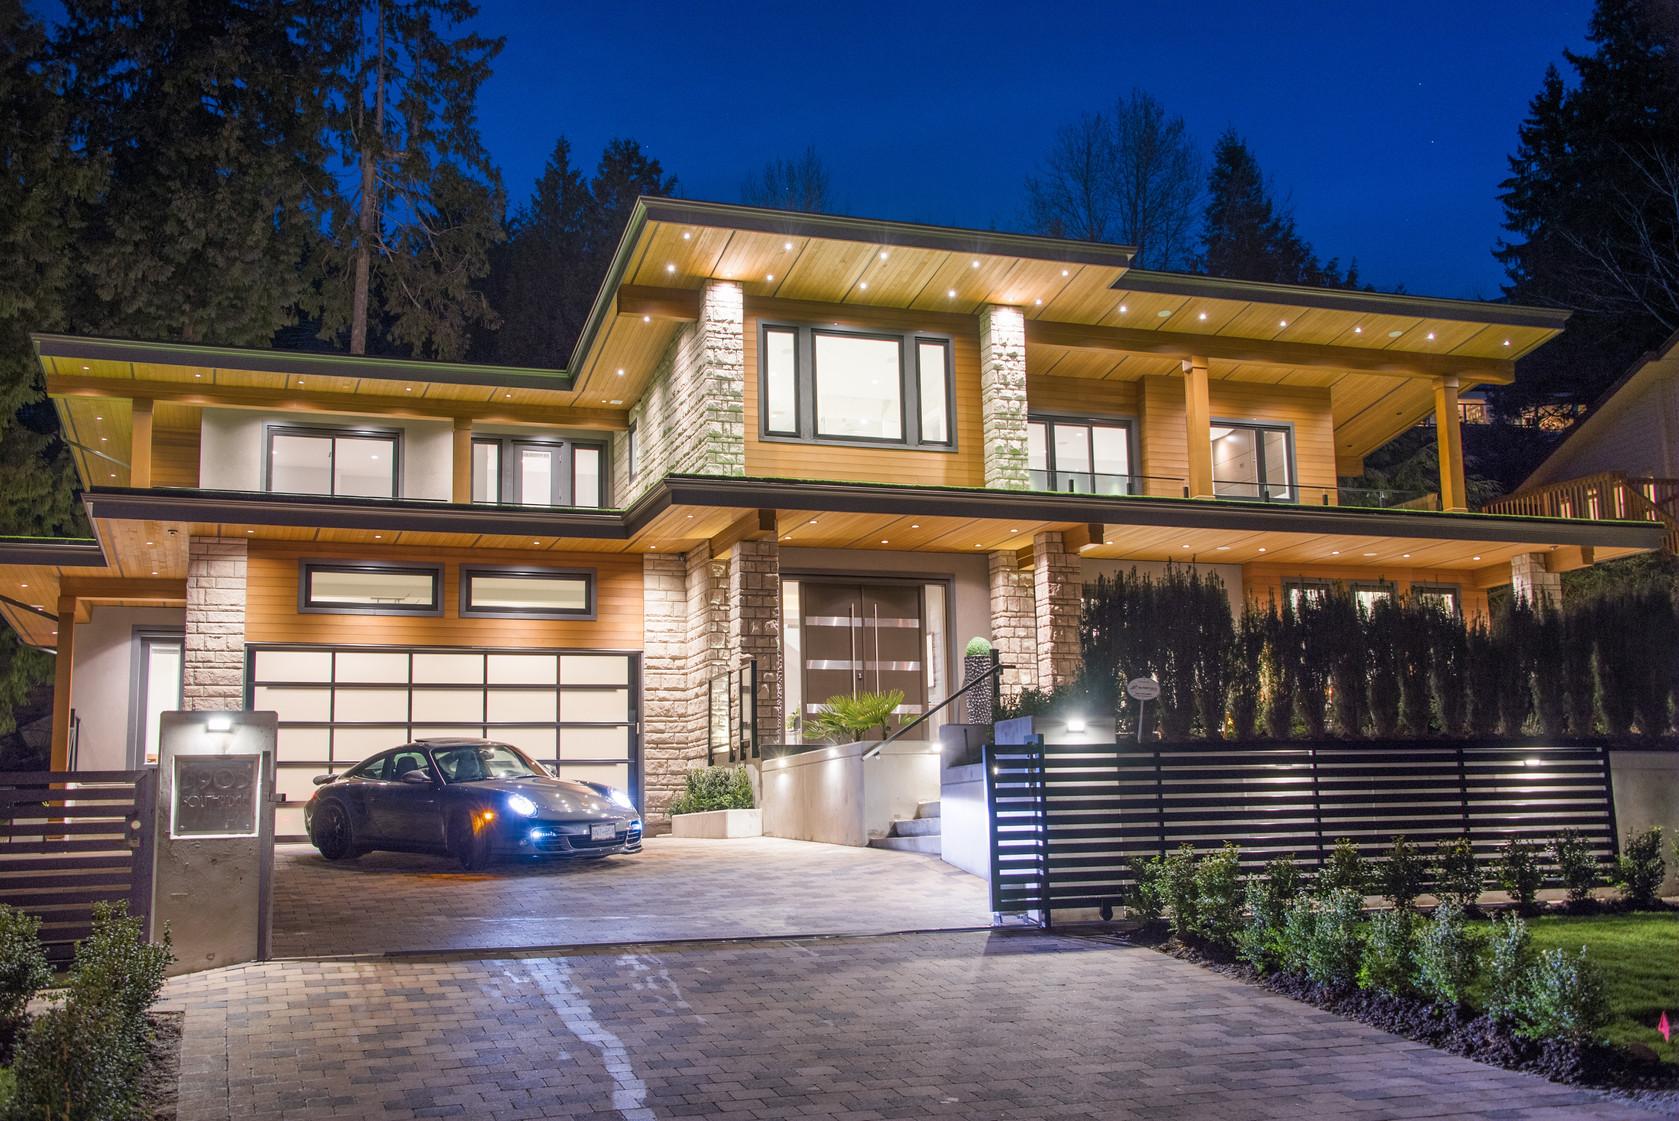 001-1 at 3905 Southridge Avenue, Bayridge, West Vancouver